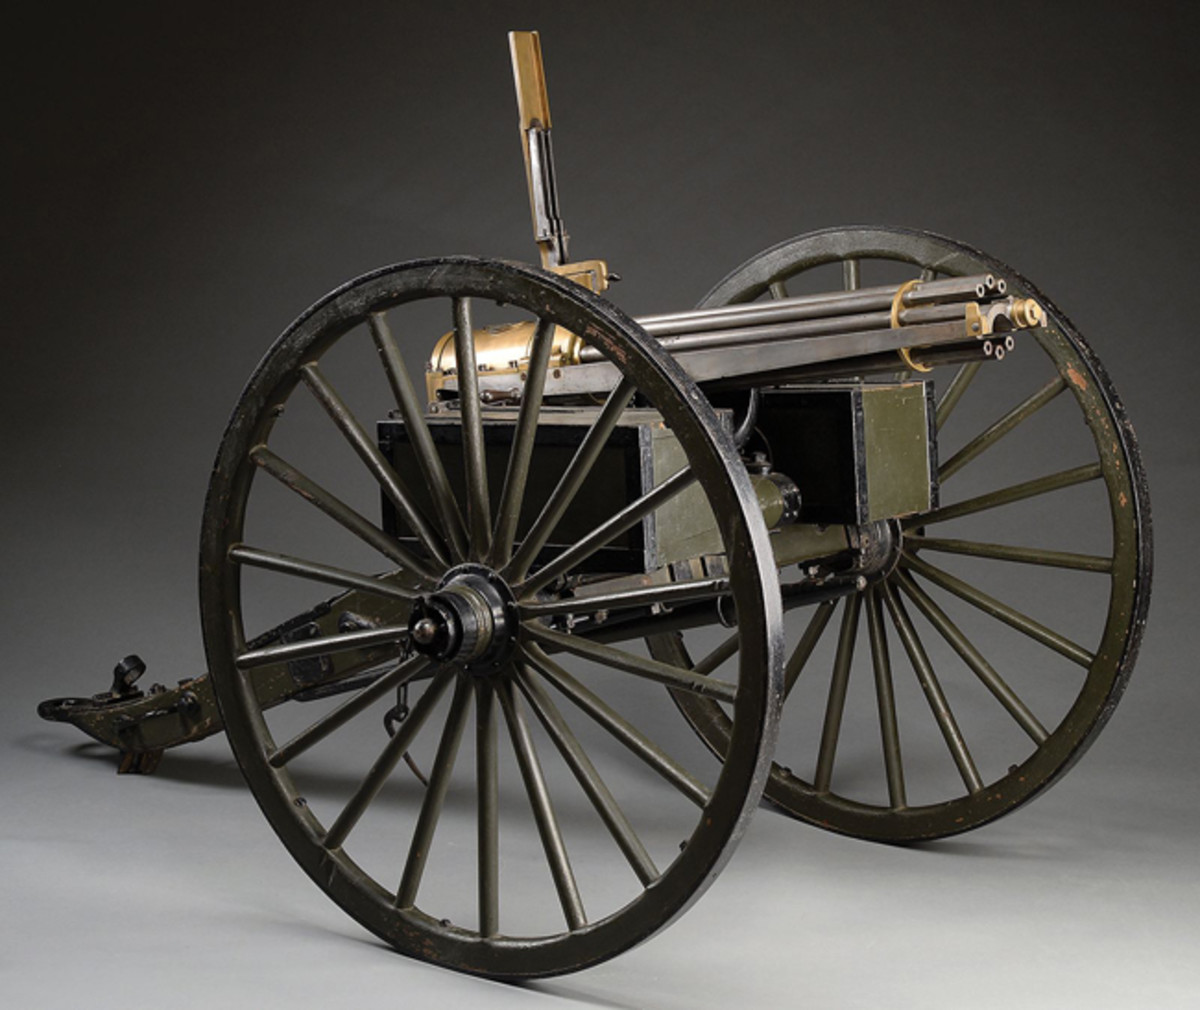 Colt Model 1875 Gatling gun on an original carriage